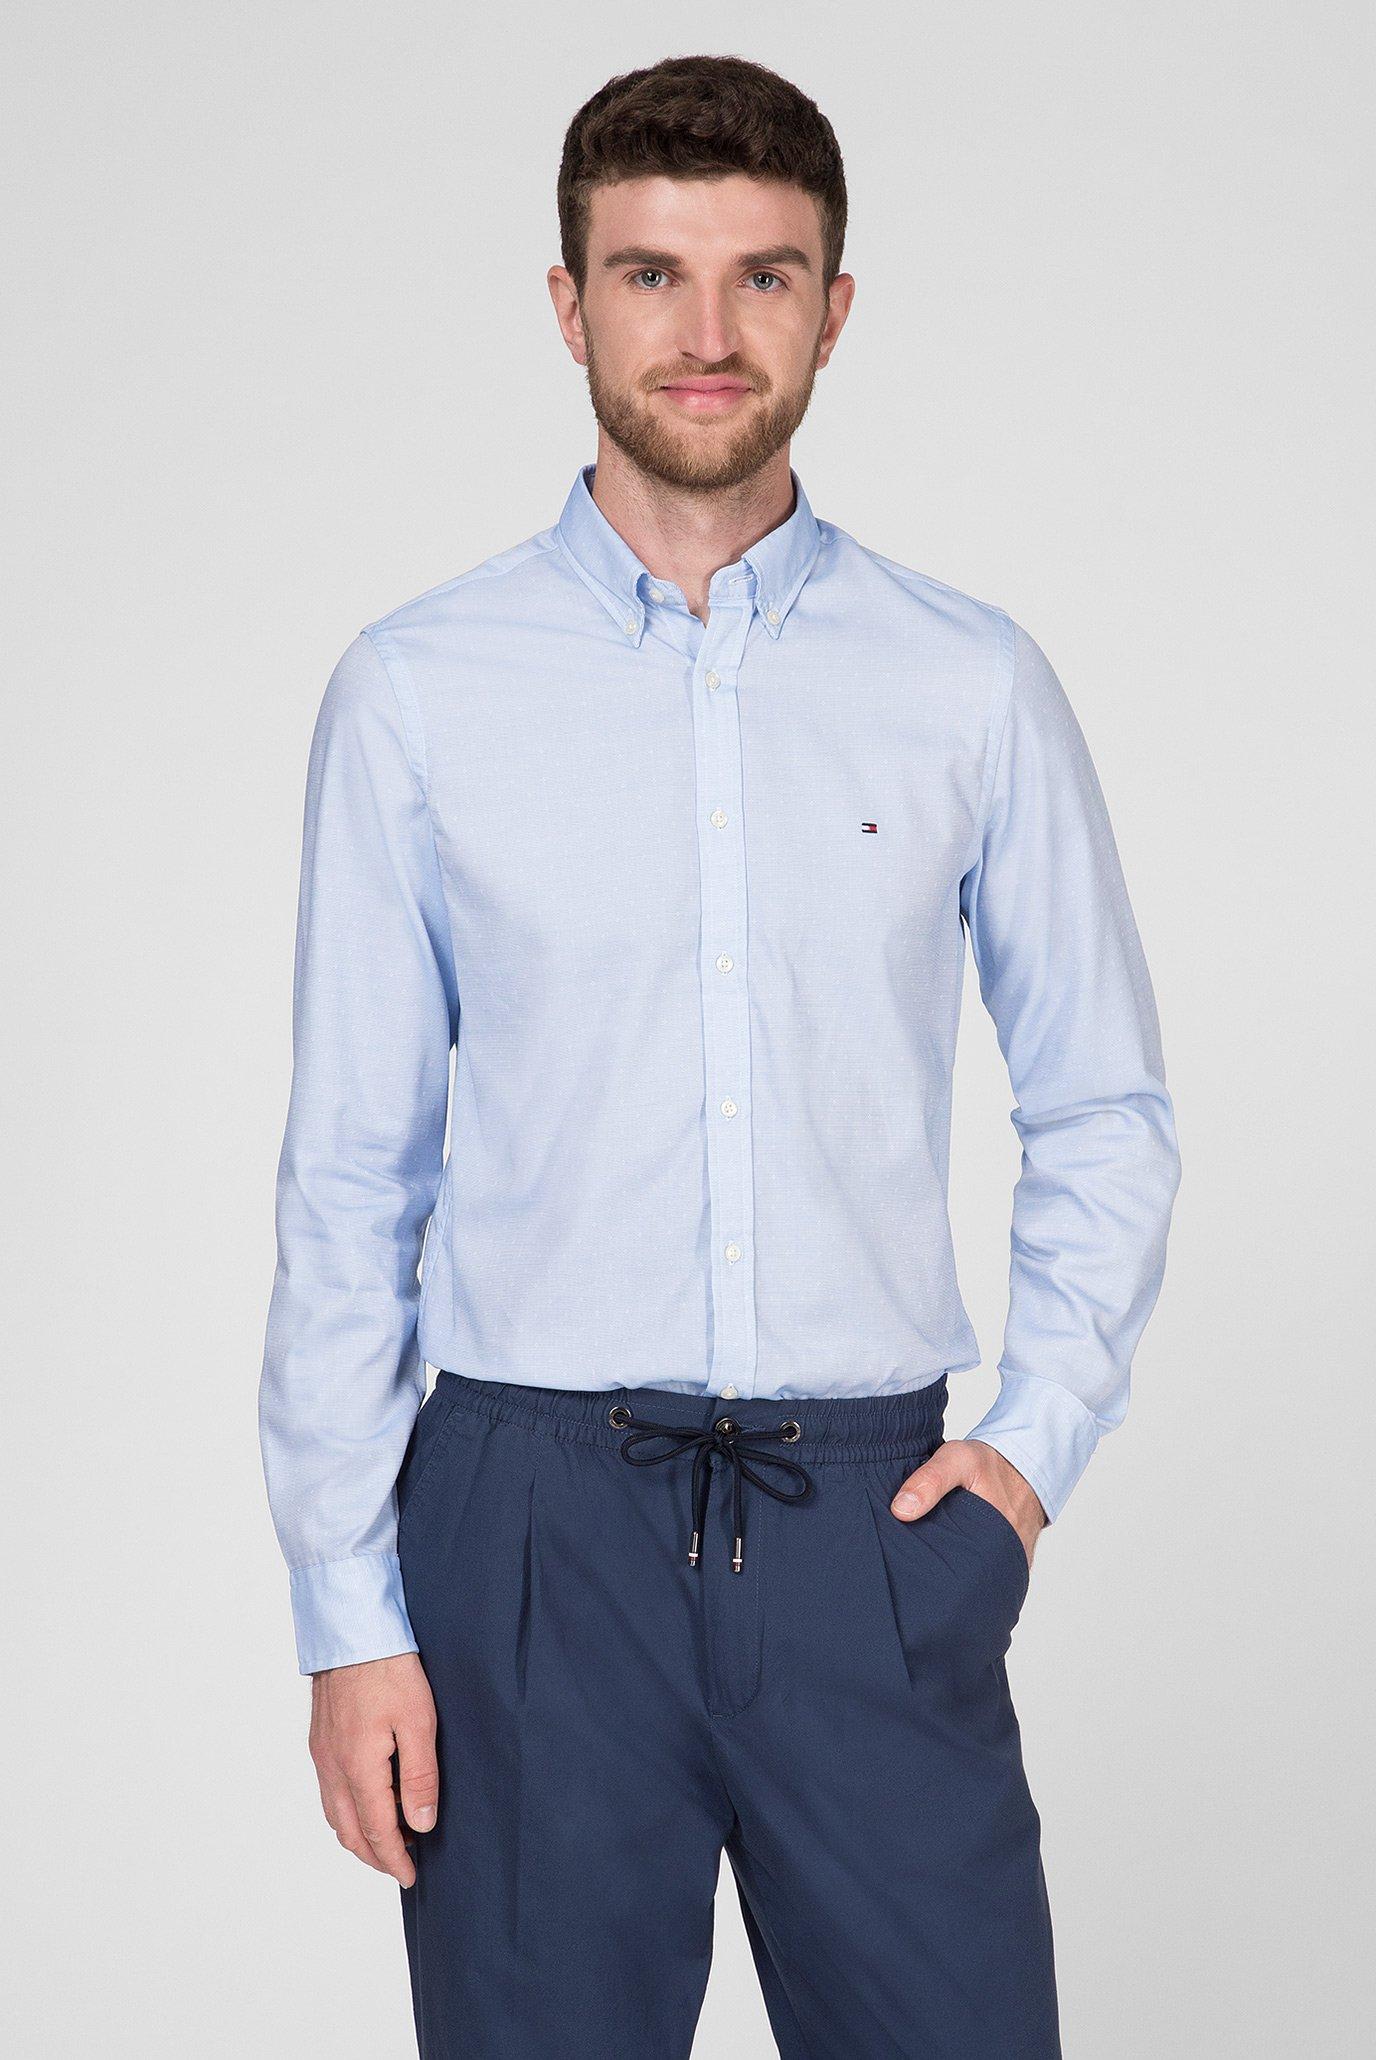 87806d7e180a Купить Мужская голубая рубашка SLIM END ON END DOBBY Tommy Hilfiger ...